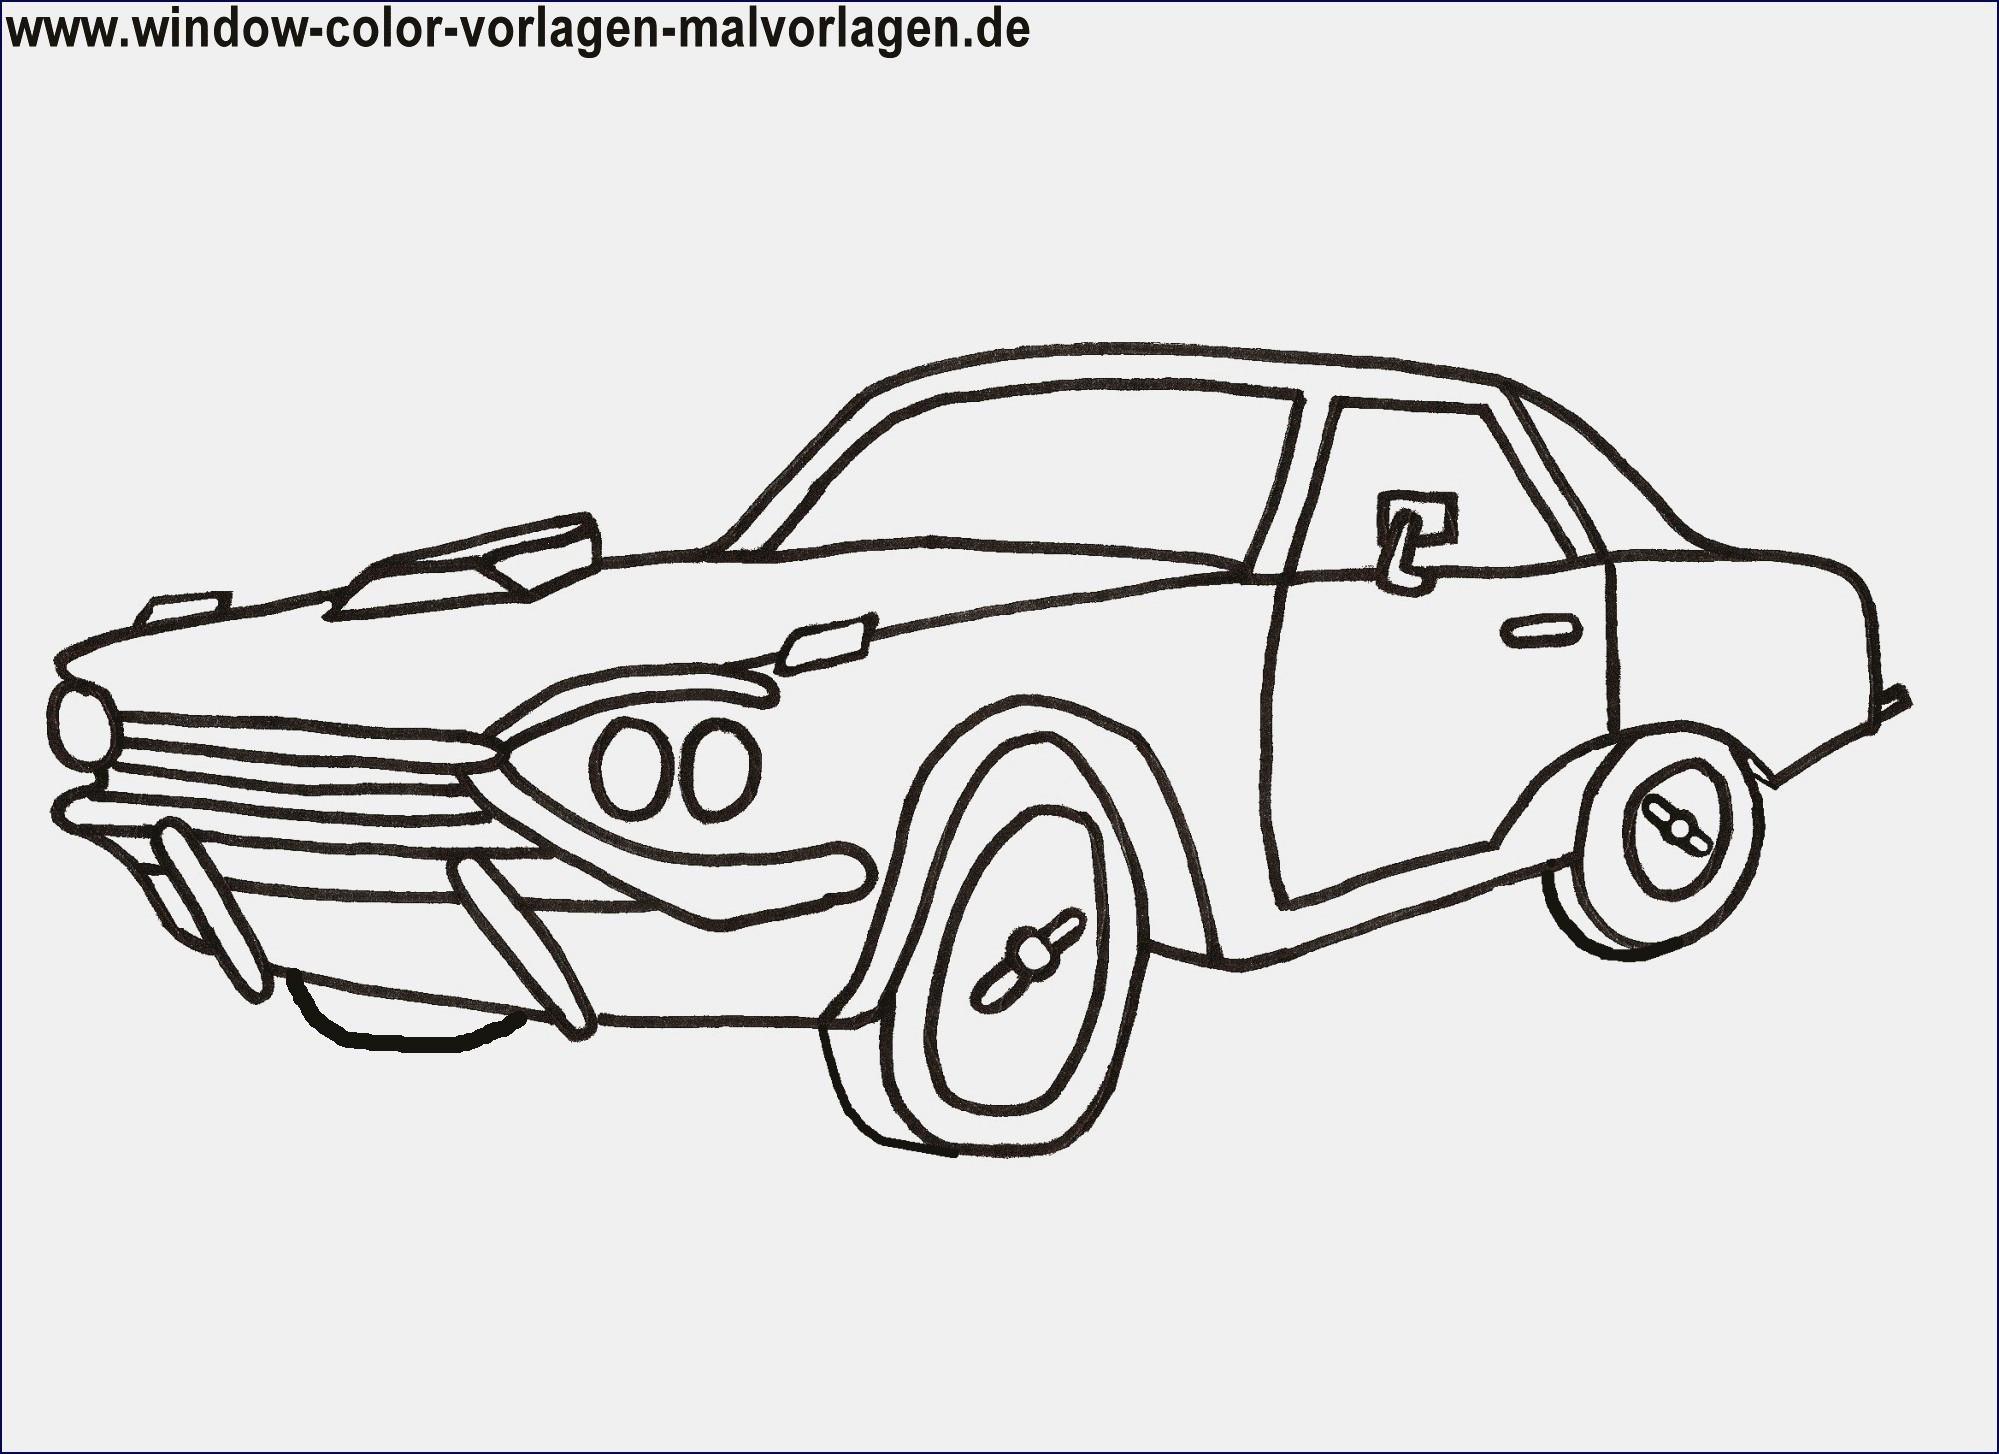 Lightning Mcqueen Malvorlage Inspirierend Awesome Colouring Disney Cars Genial Cars Ausmalbilder Lightning Stock